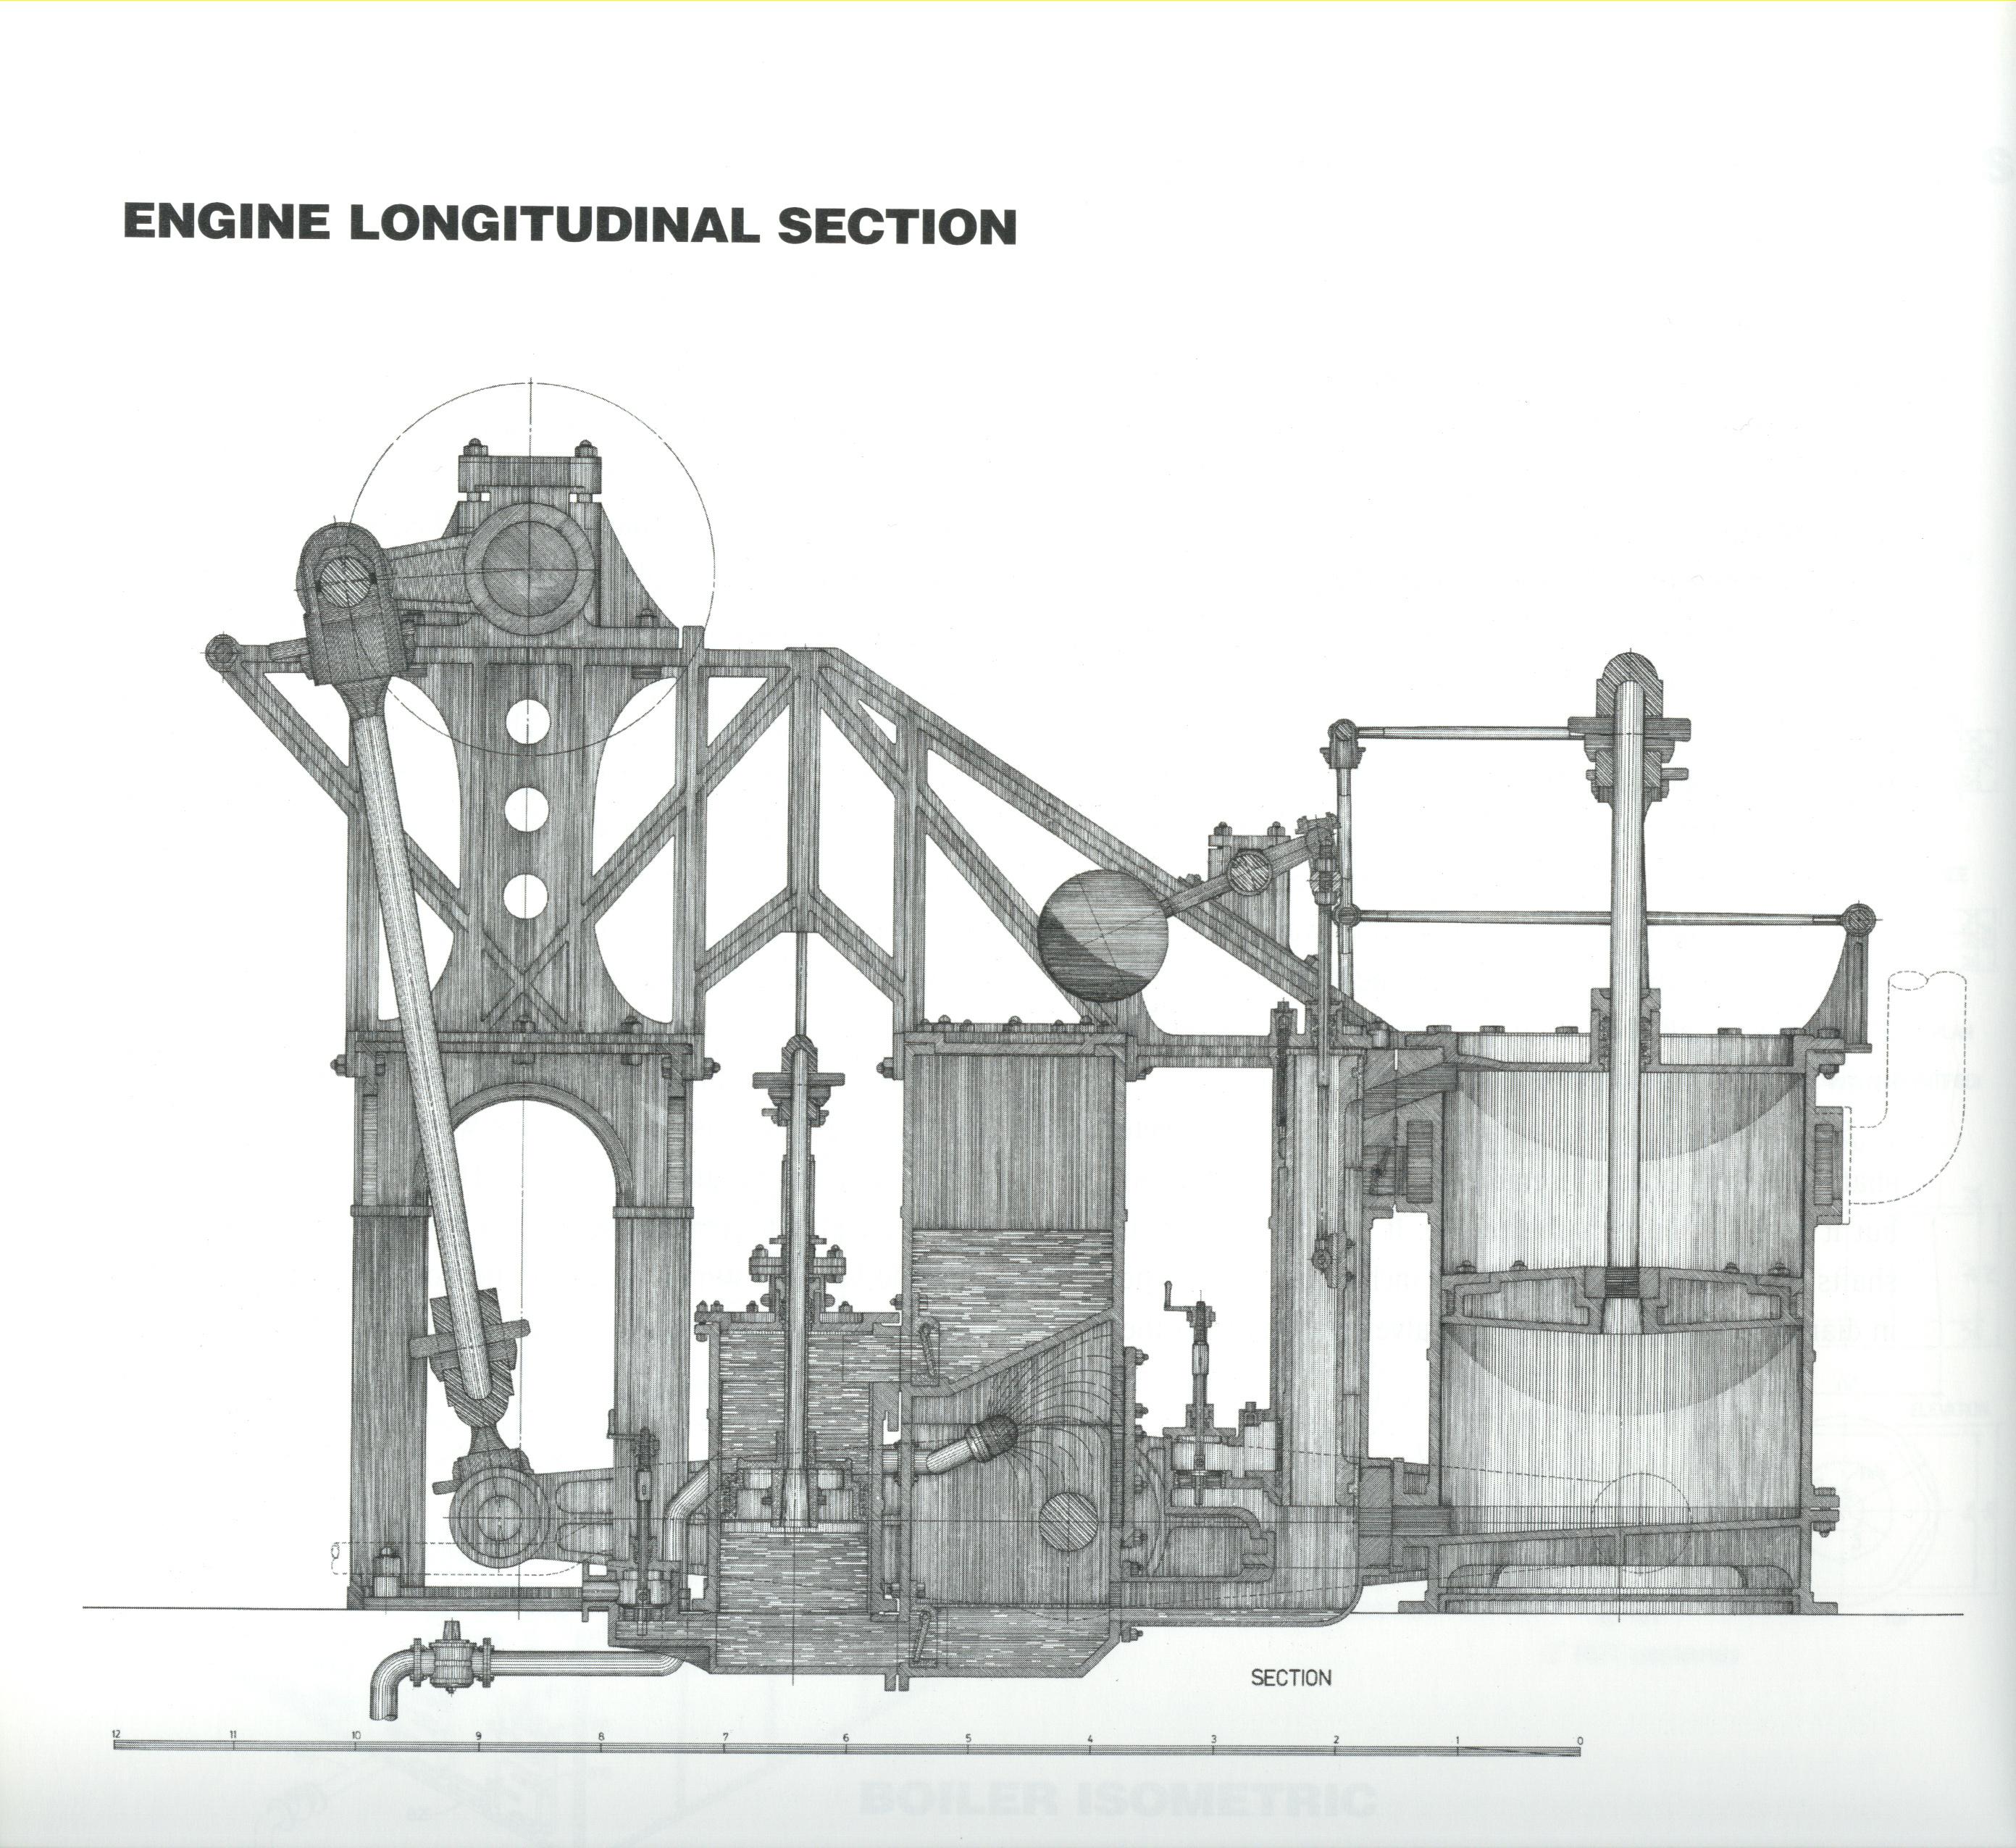 https://0901.nccdn.net/4_2/000/000/038/2d3/Plan---Beaver-Engine-Longitudinal-Section-2783x2551.jpg